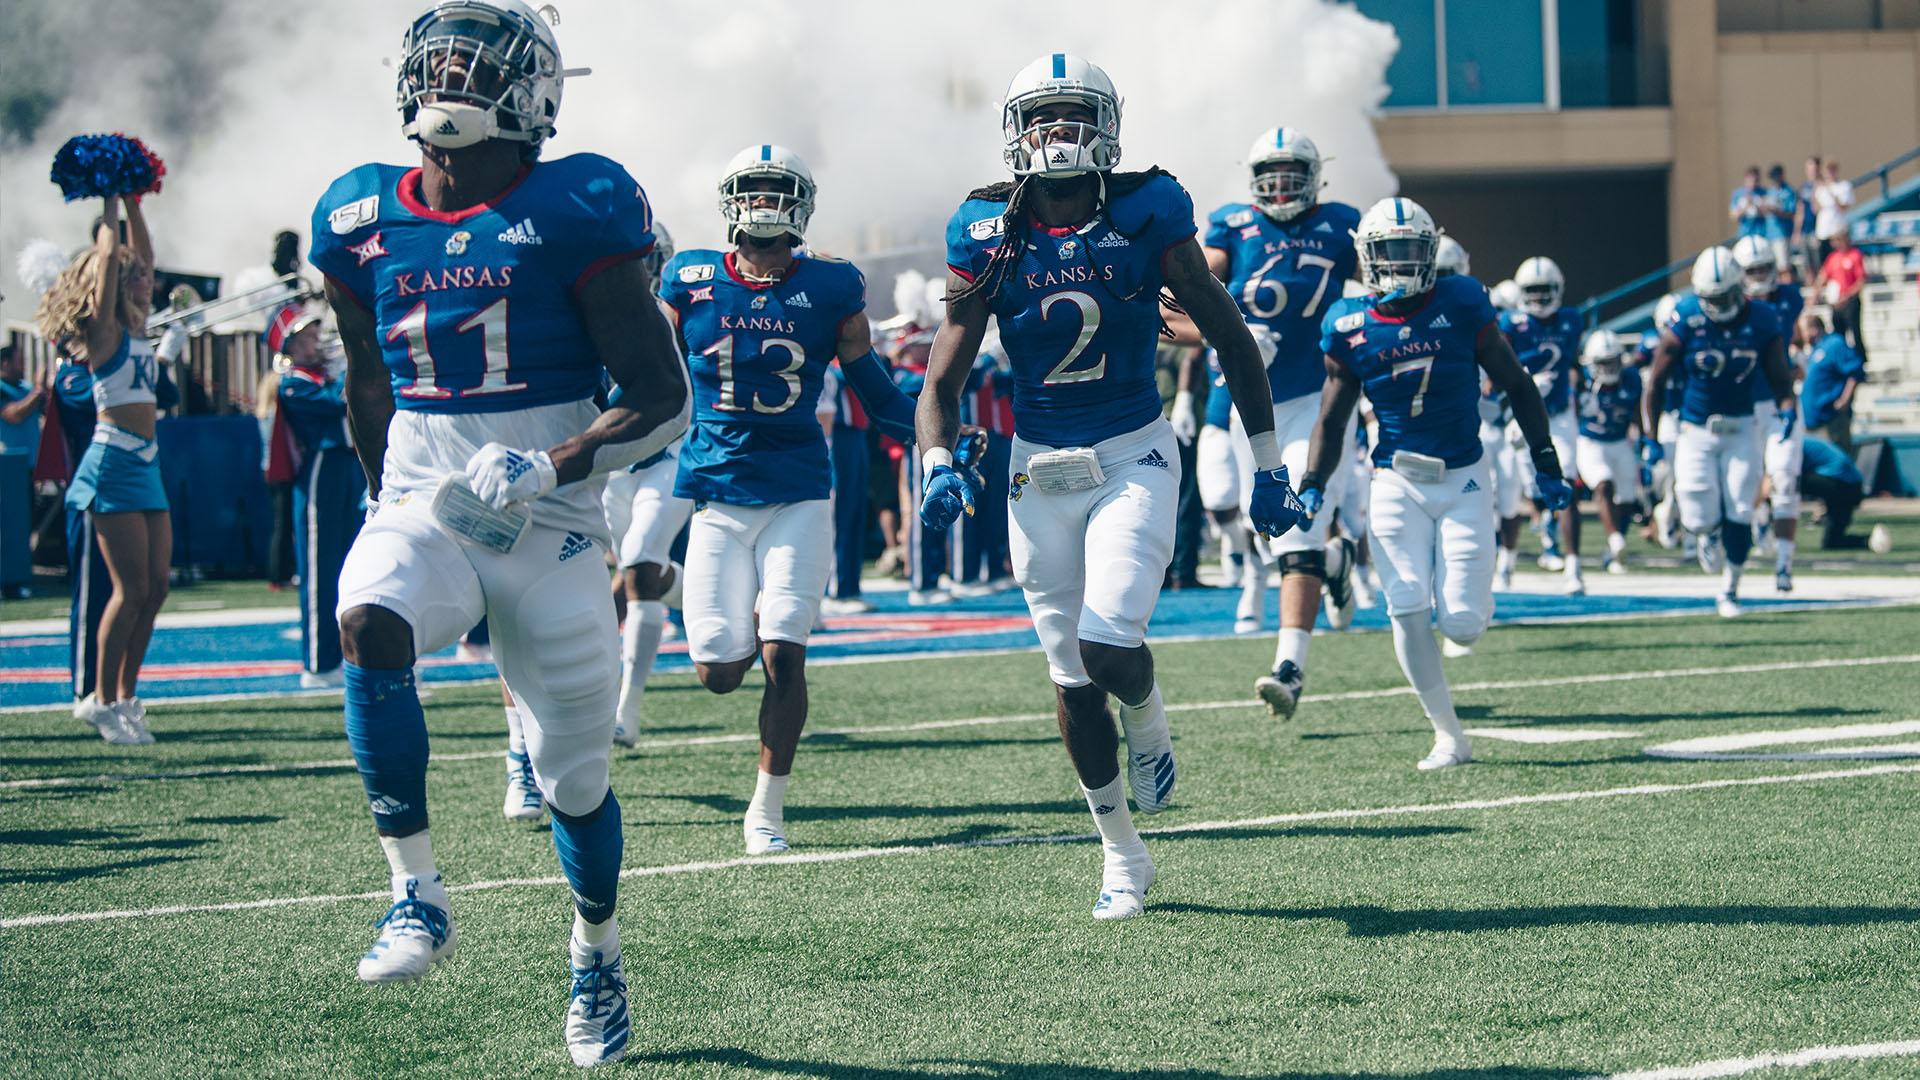 players run onto field